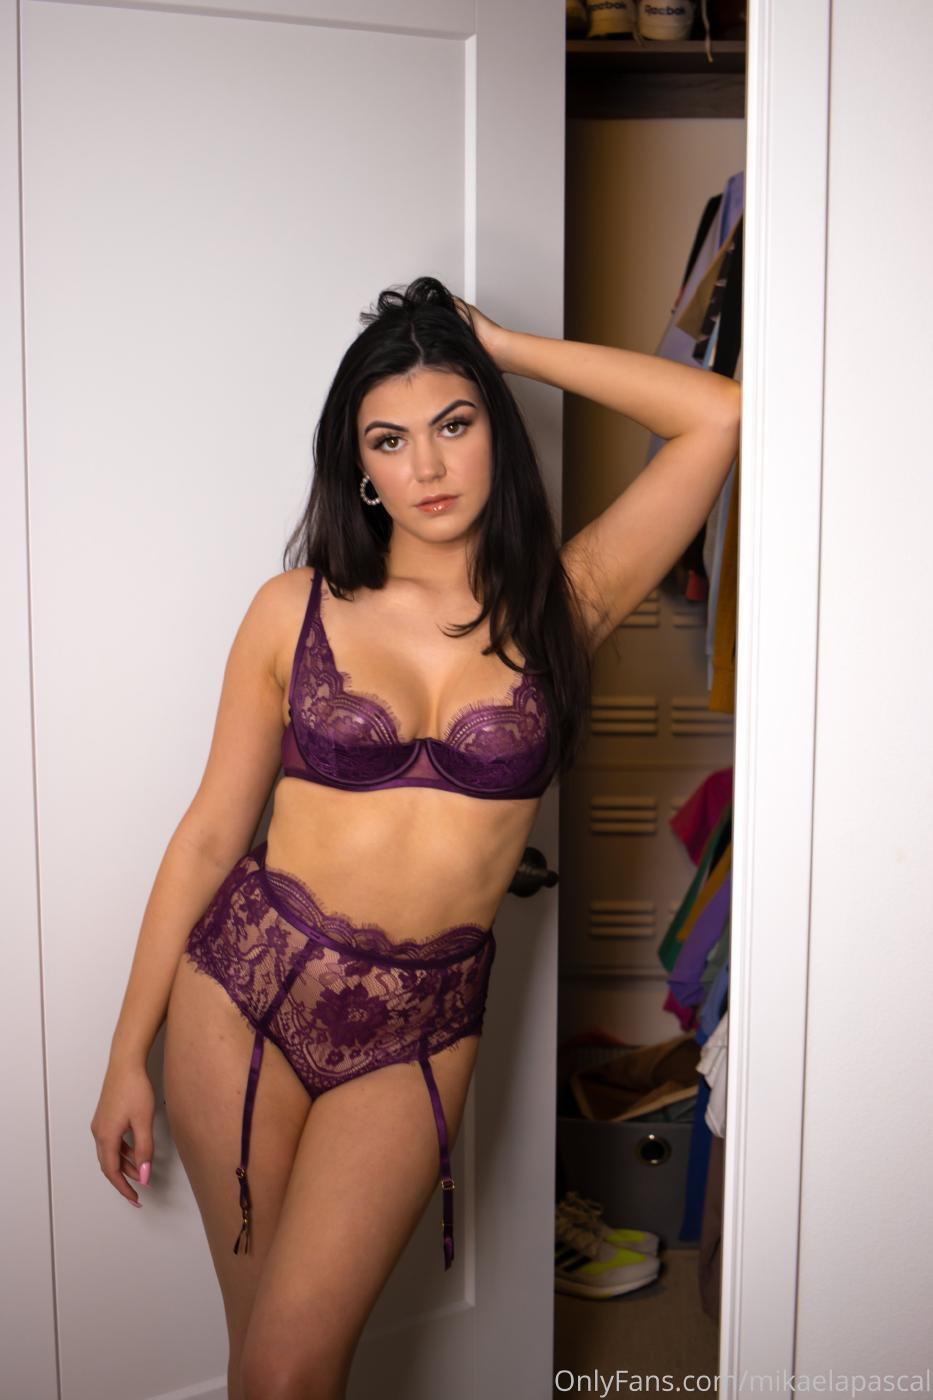 Mikaela Pascal Purple Lace Lingerie Onlyfans Set Leaked Auxdag